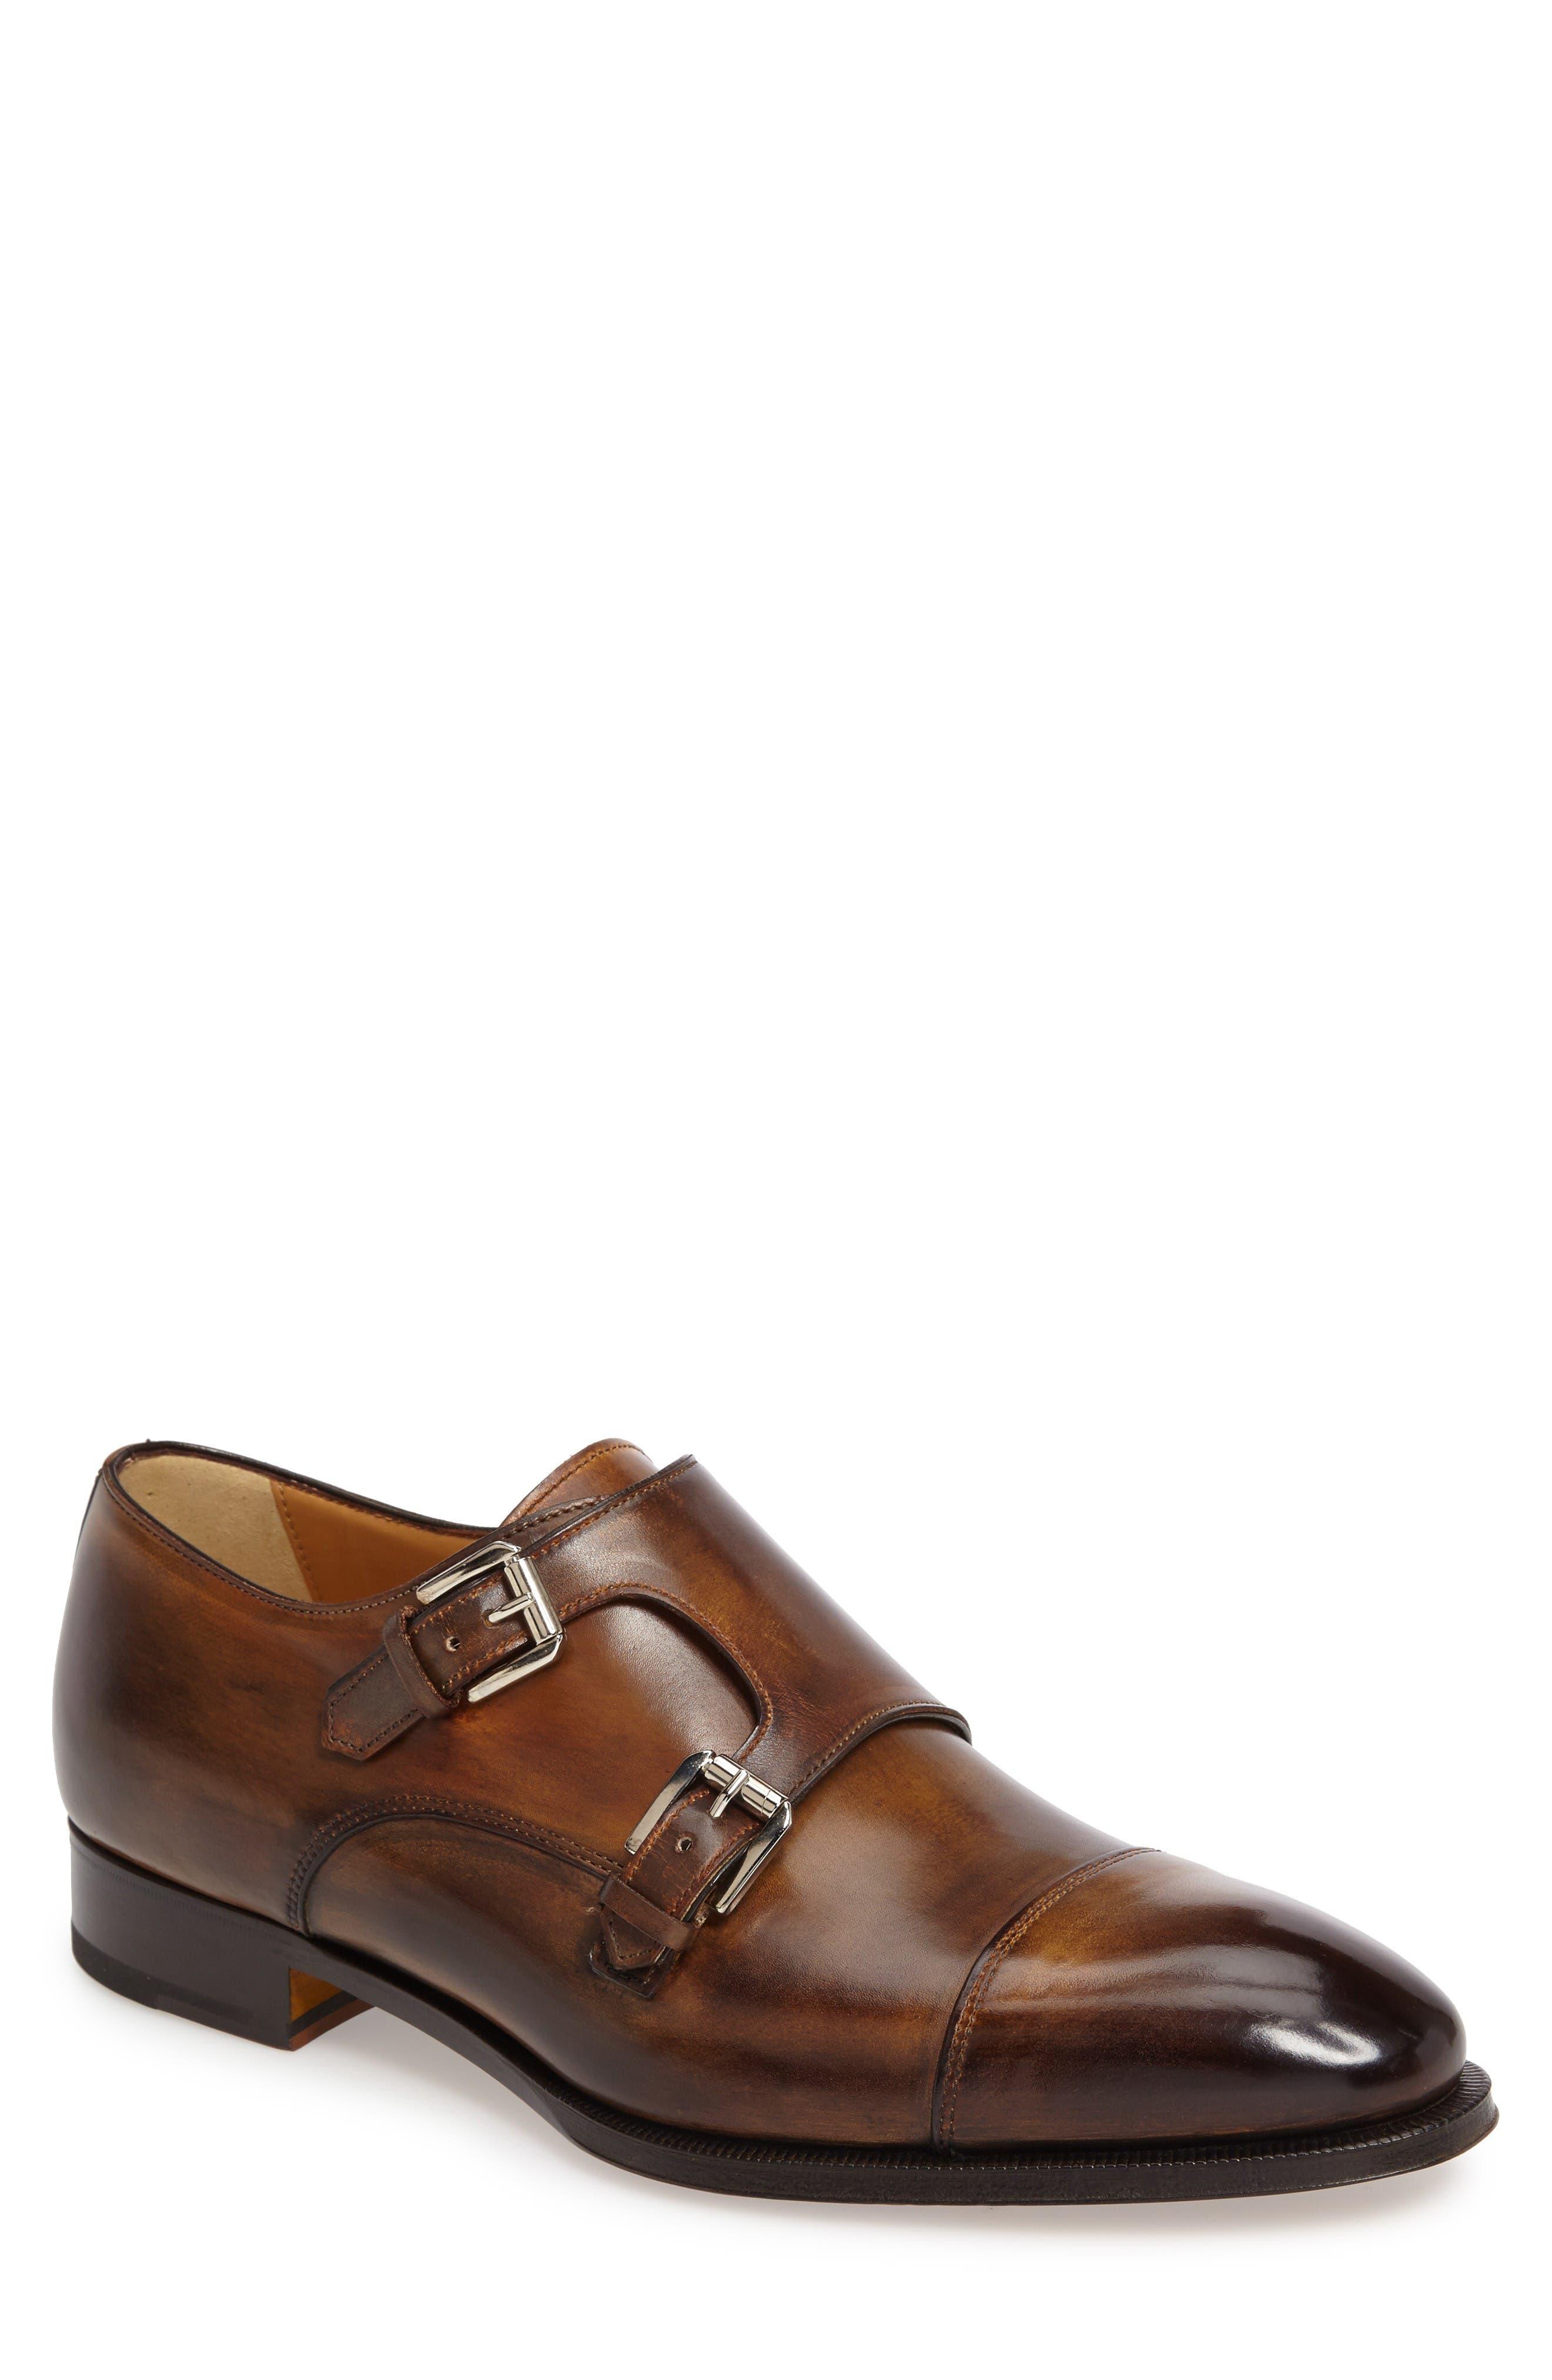 Alternate Image 1 Selected - Di Gallo Bianco Blake Double Monk Strap Shoe (Men)